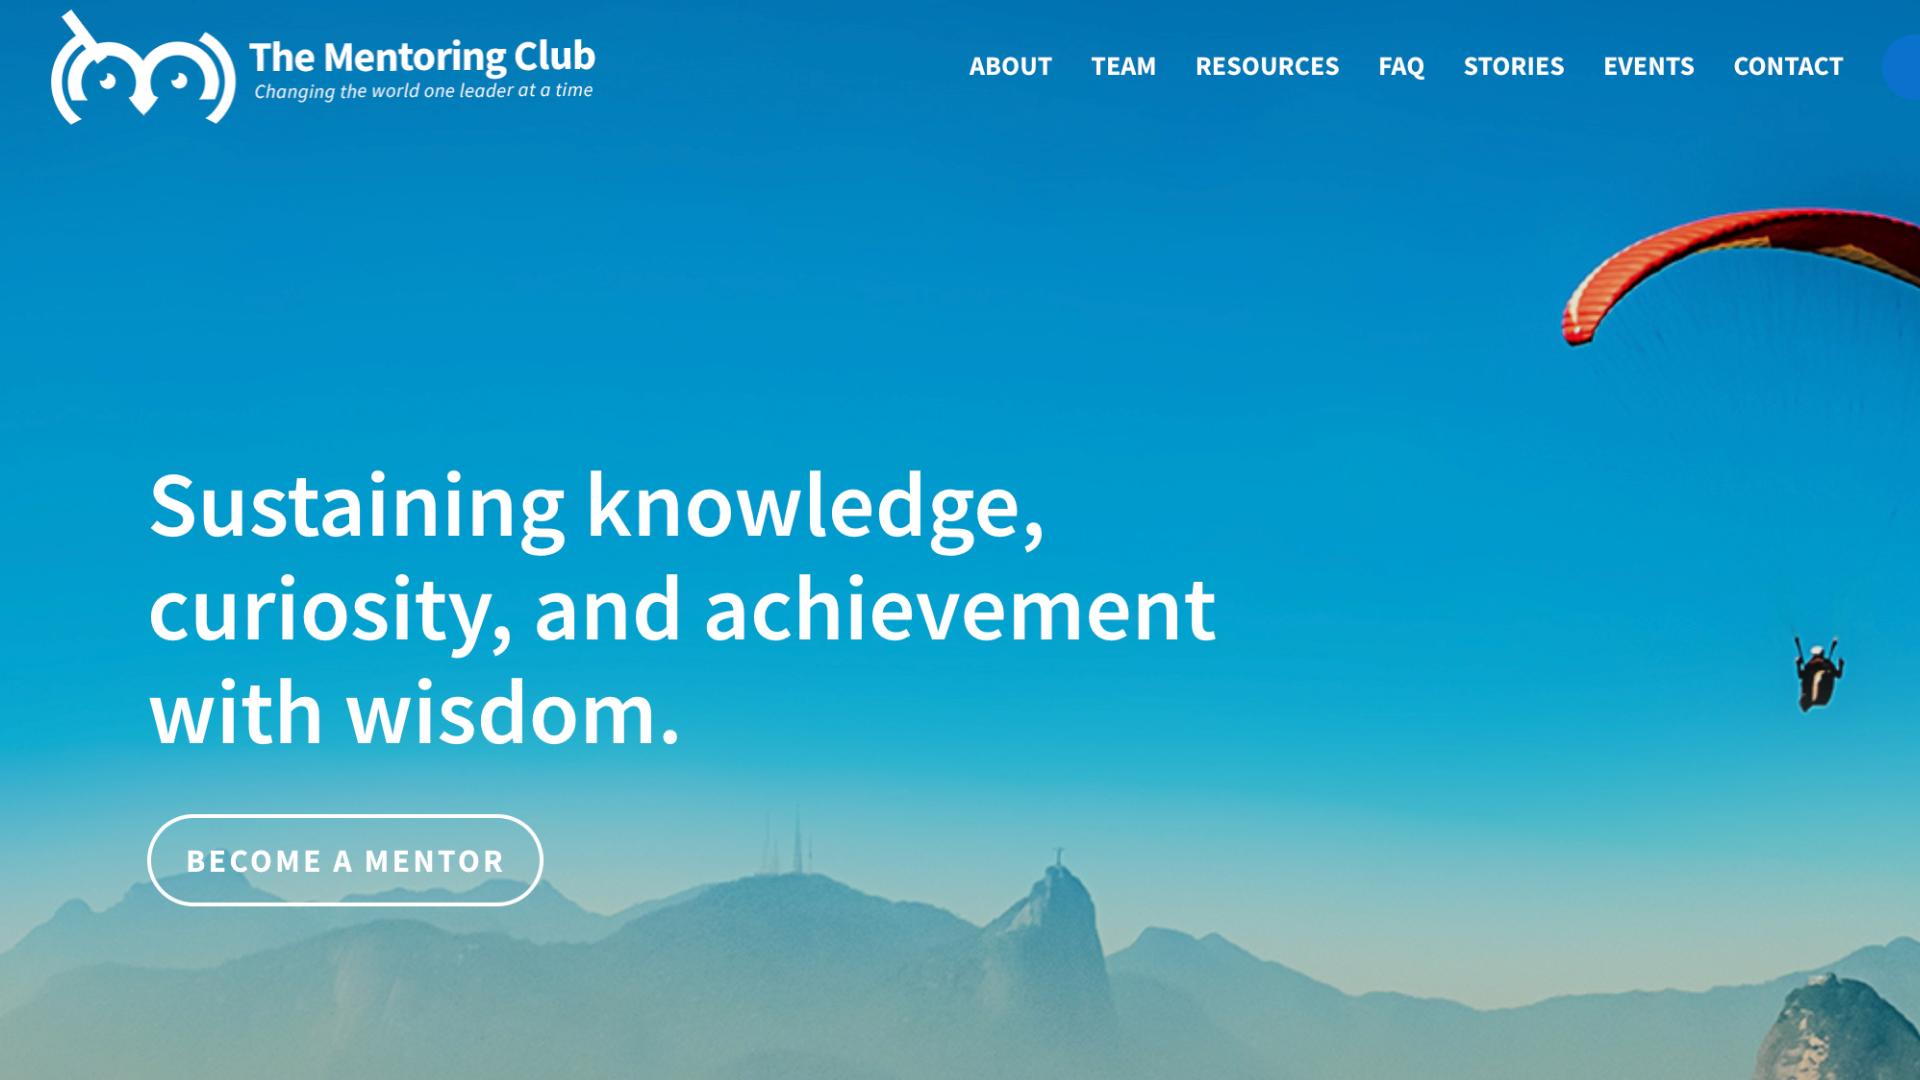 The Mentoring Club